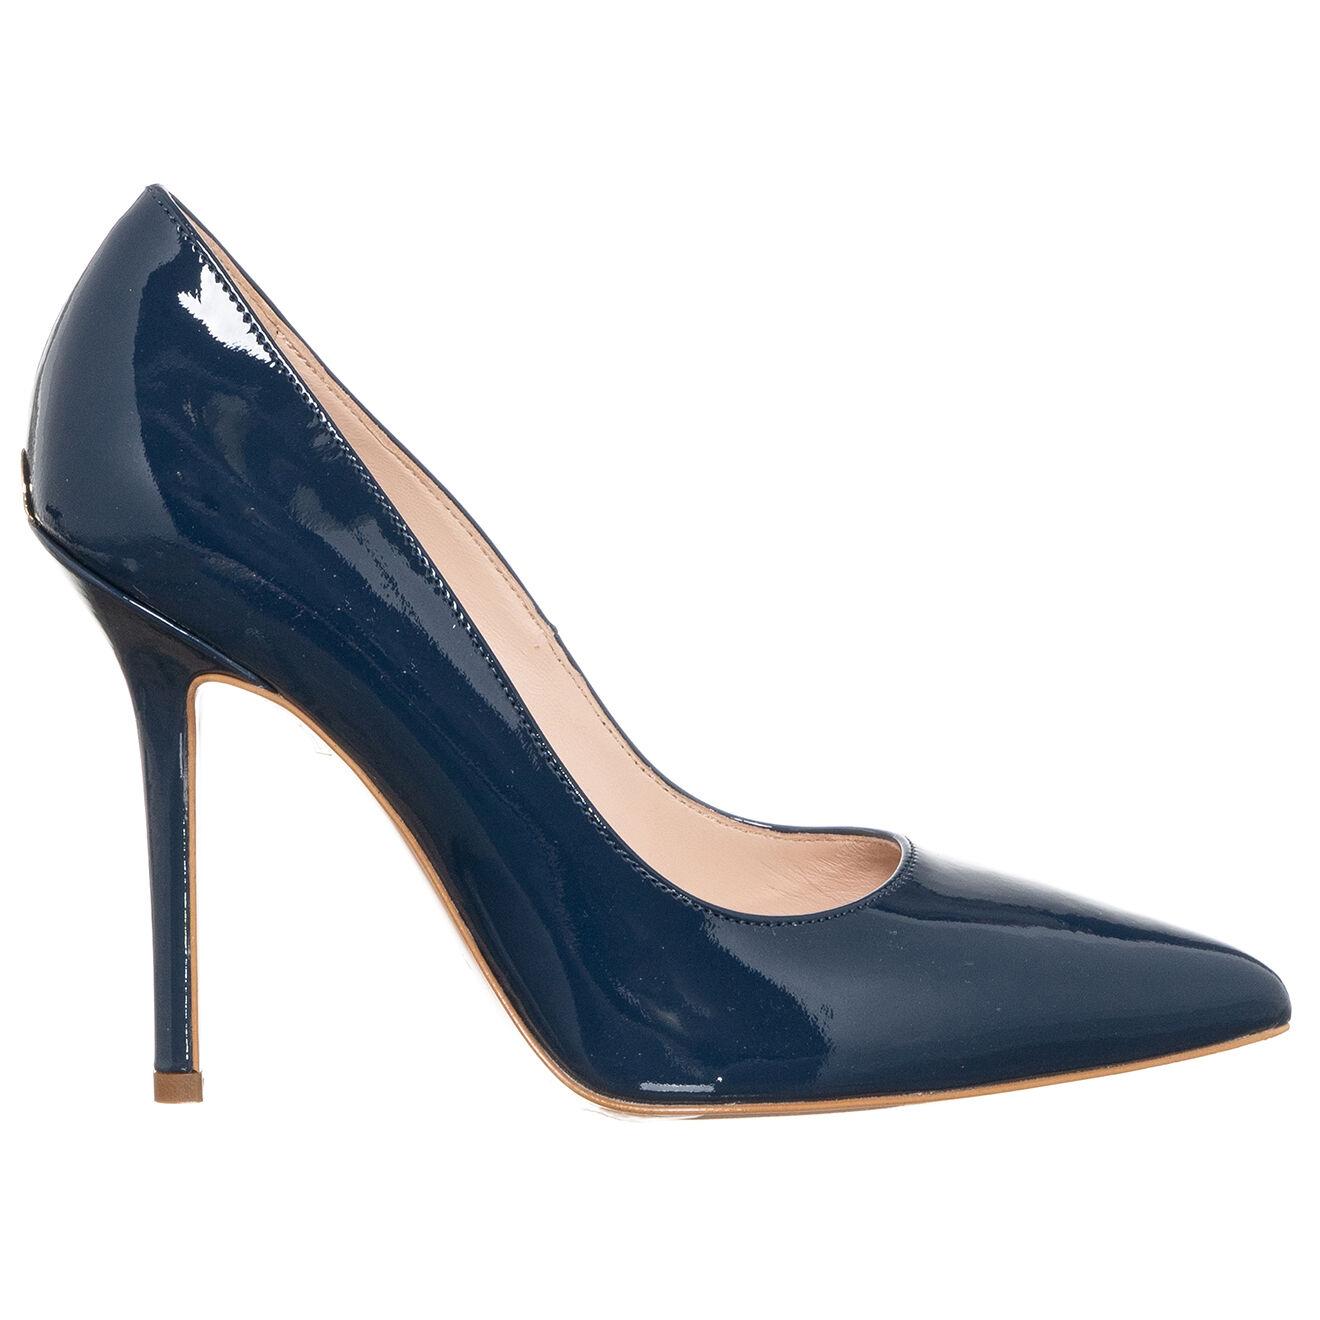 Escarpins en Cuir vernis Marilyn bleus - Talon 10 cm - Liu-Jo - Modalova